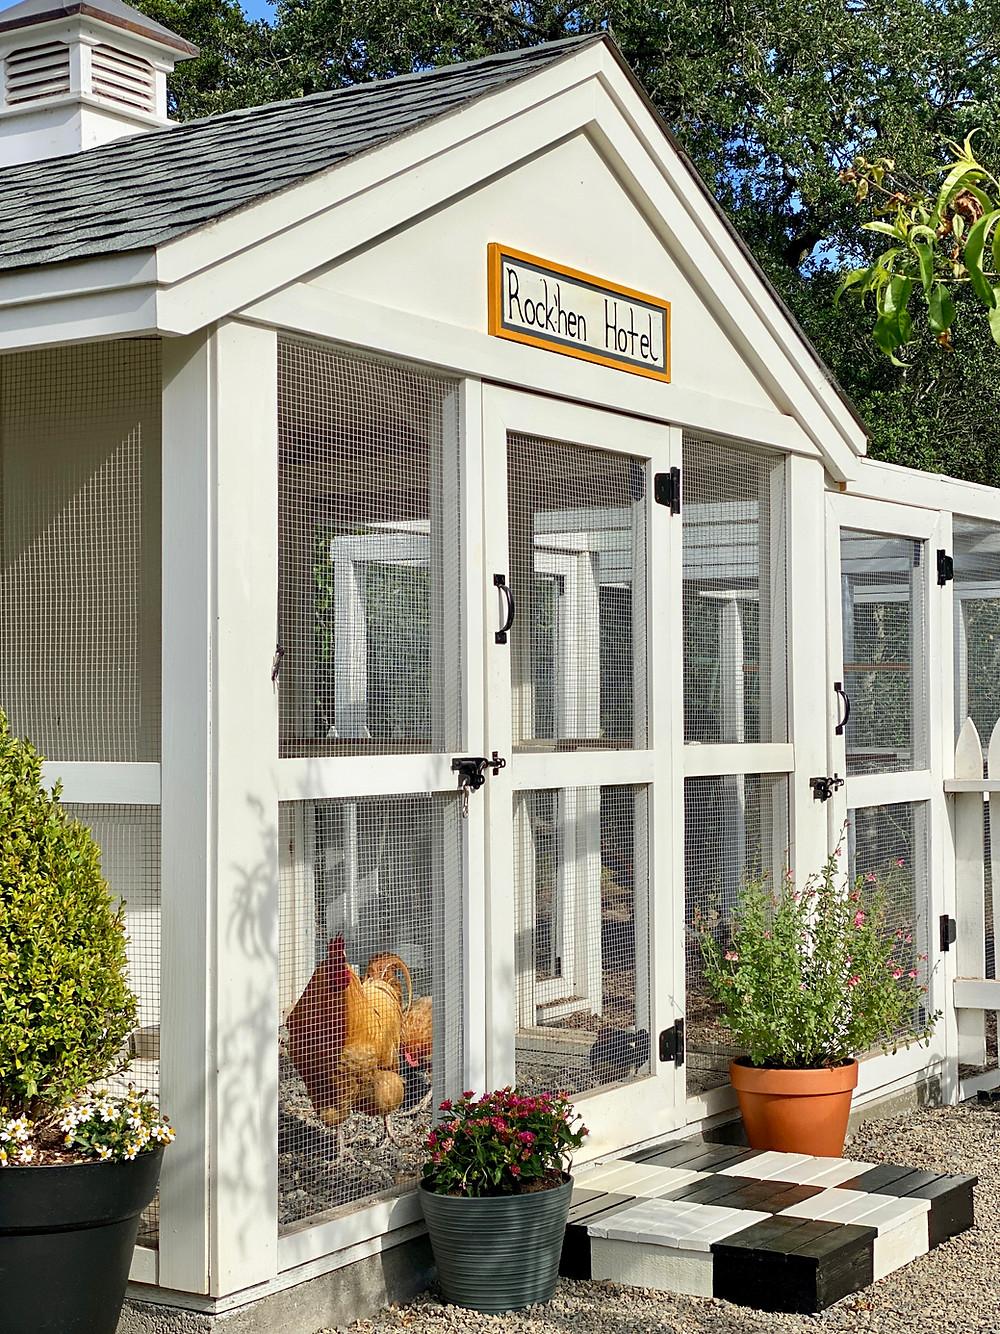 Best Chicken Coops, Chicken Coops, Chicken Coop Design, The Rock'hen Hotel chicken coop at Rock Haven Farm.